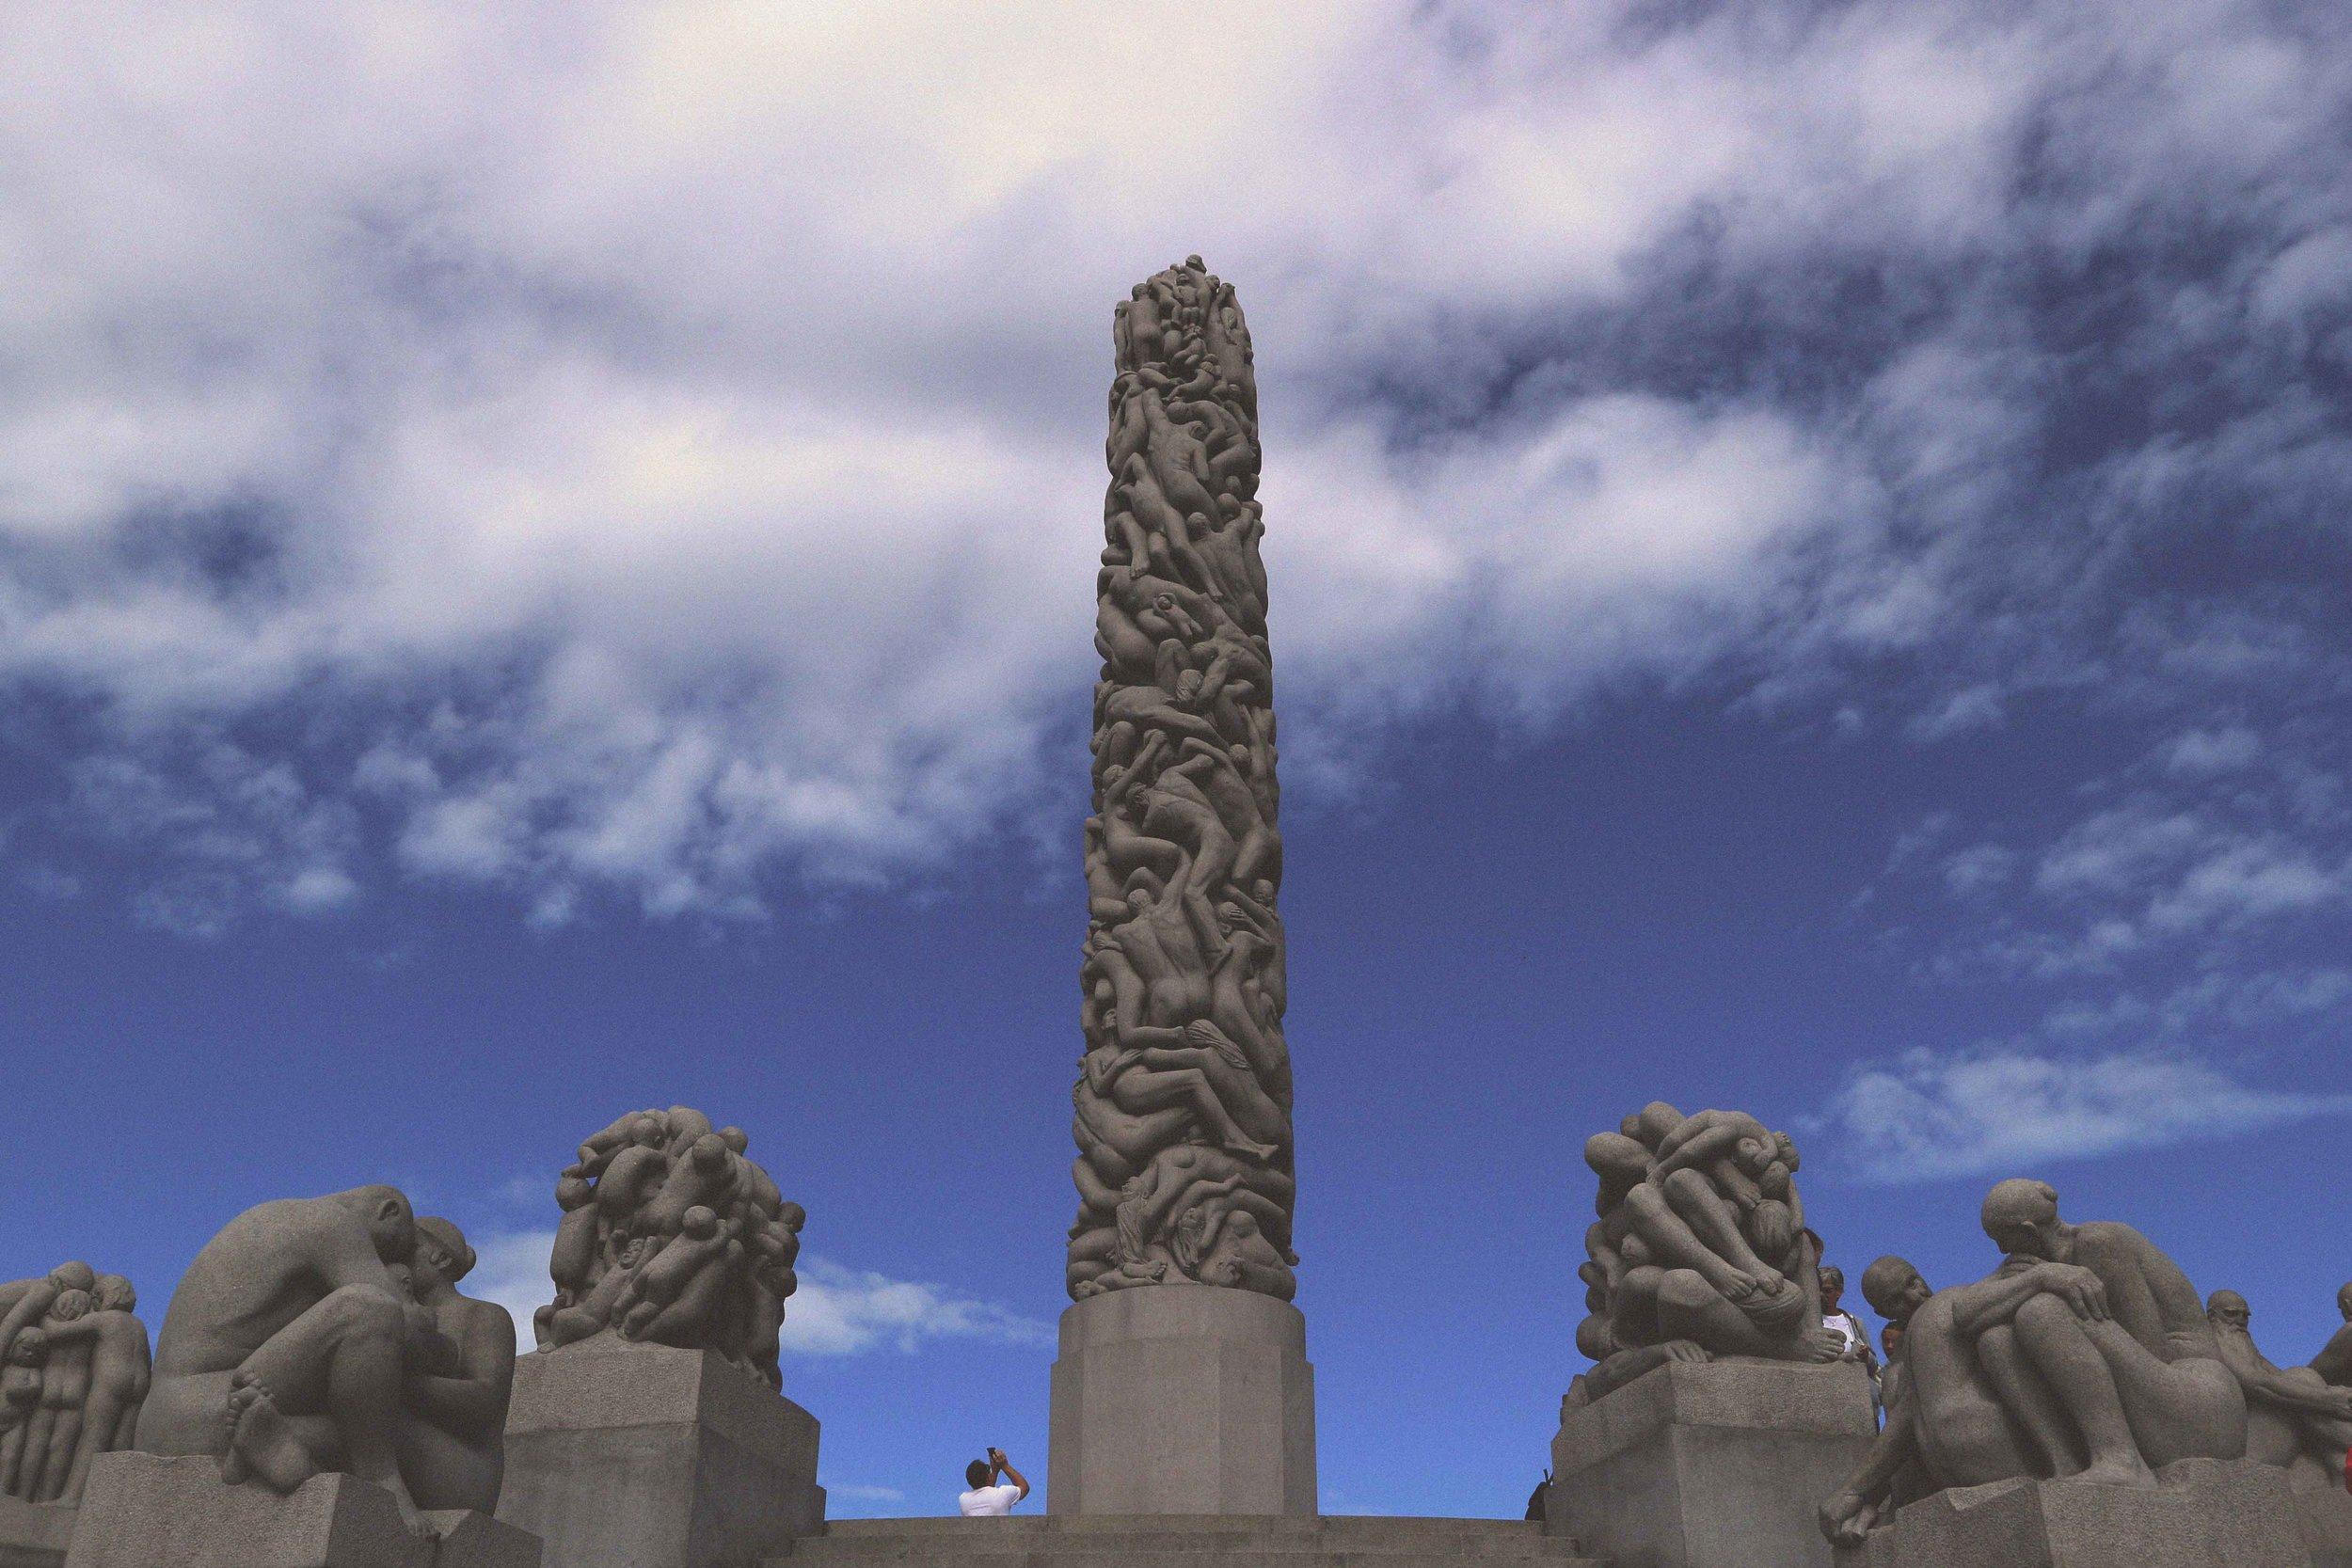 oslo sculpture 8.jpg